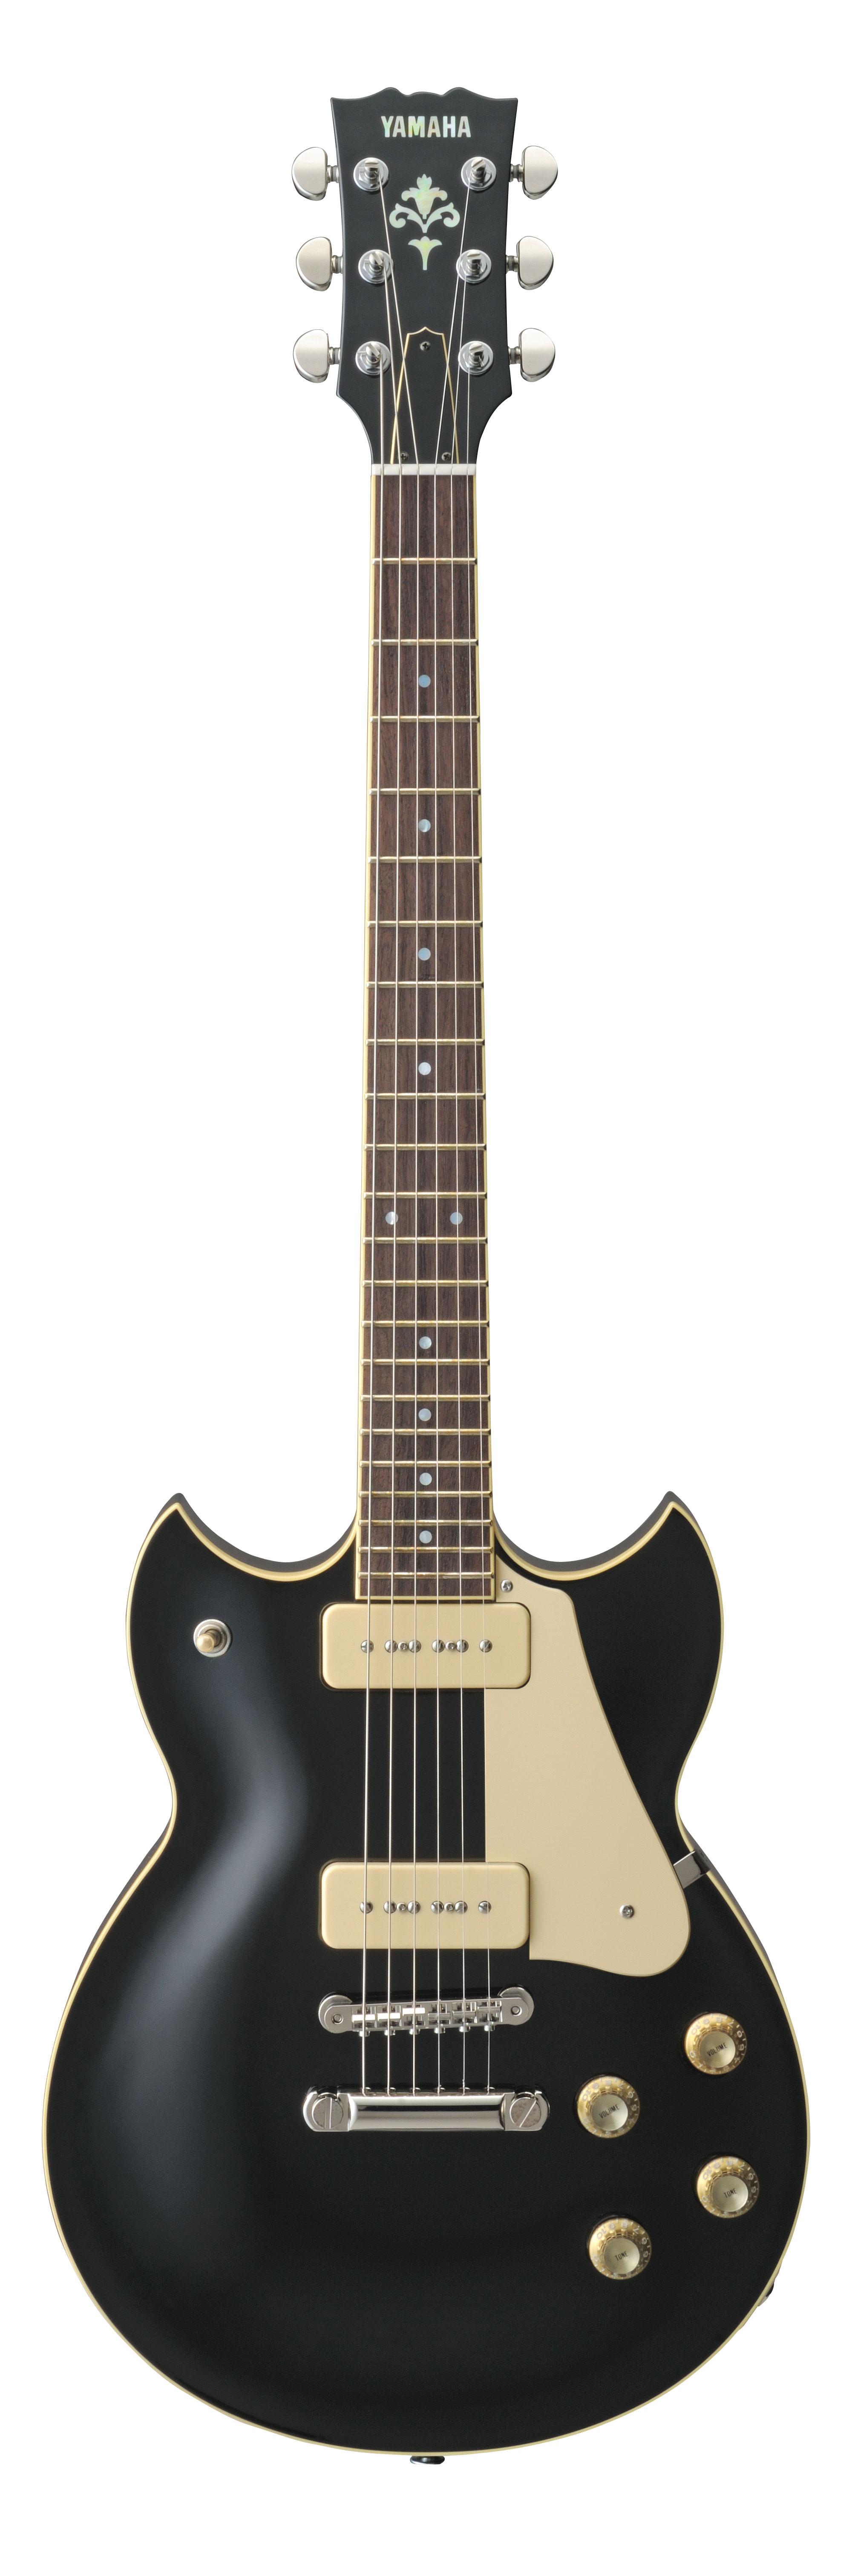 Yamaha japan guitars basses on pinterest guitar for Where are yamaha guitars made